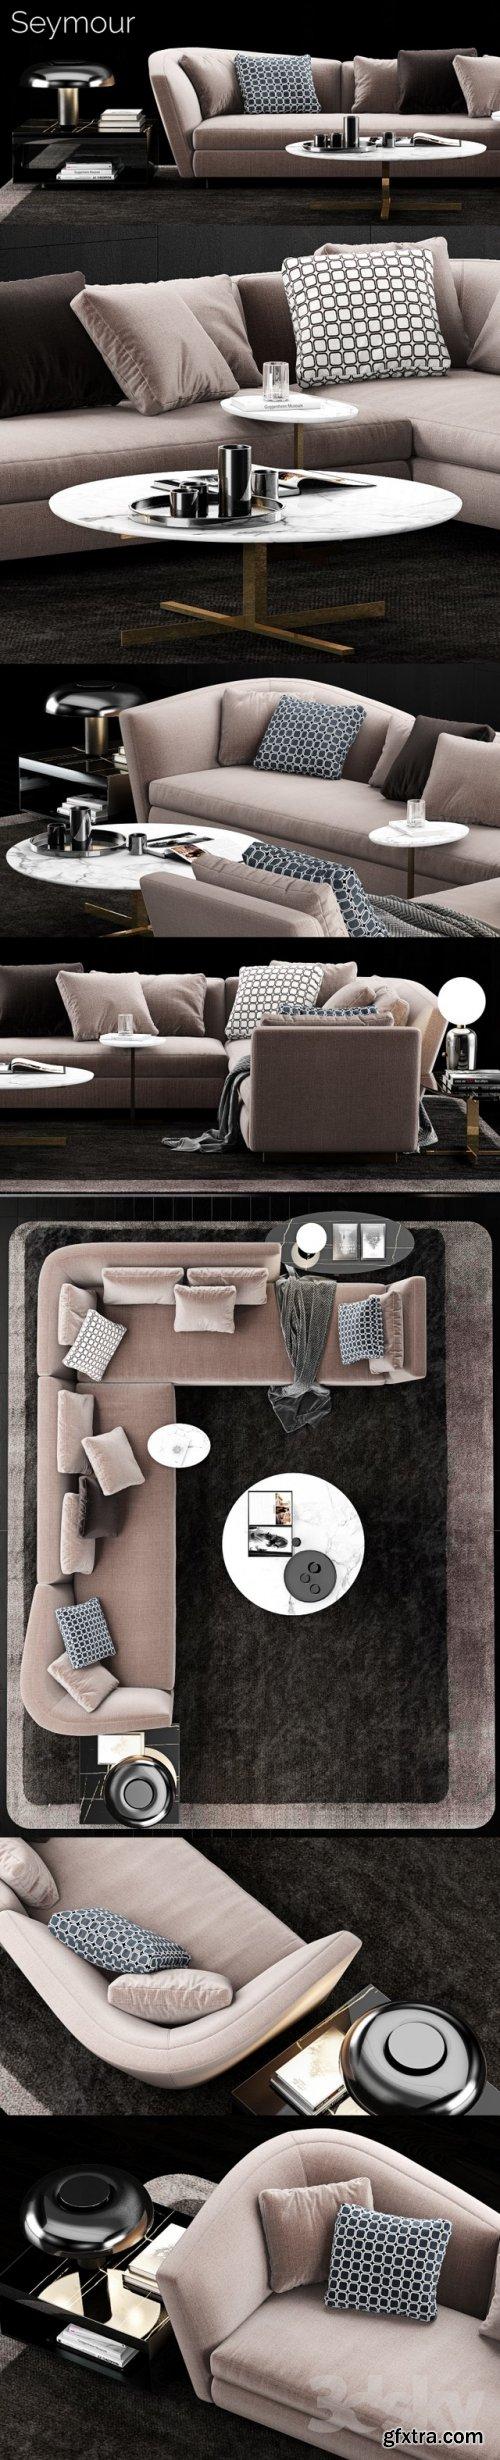 Minotti Seymour Sofa 3d MODEL